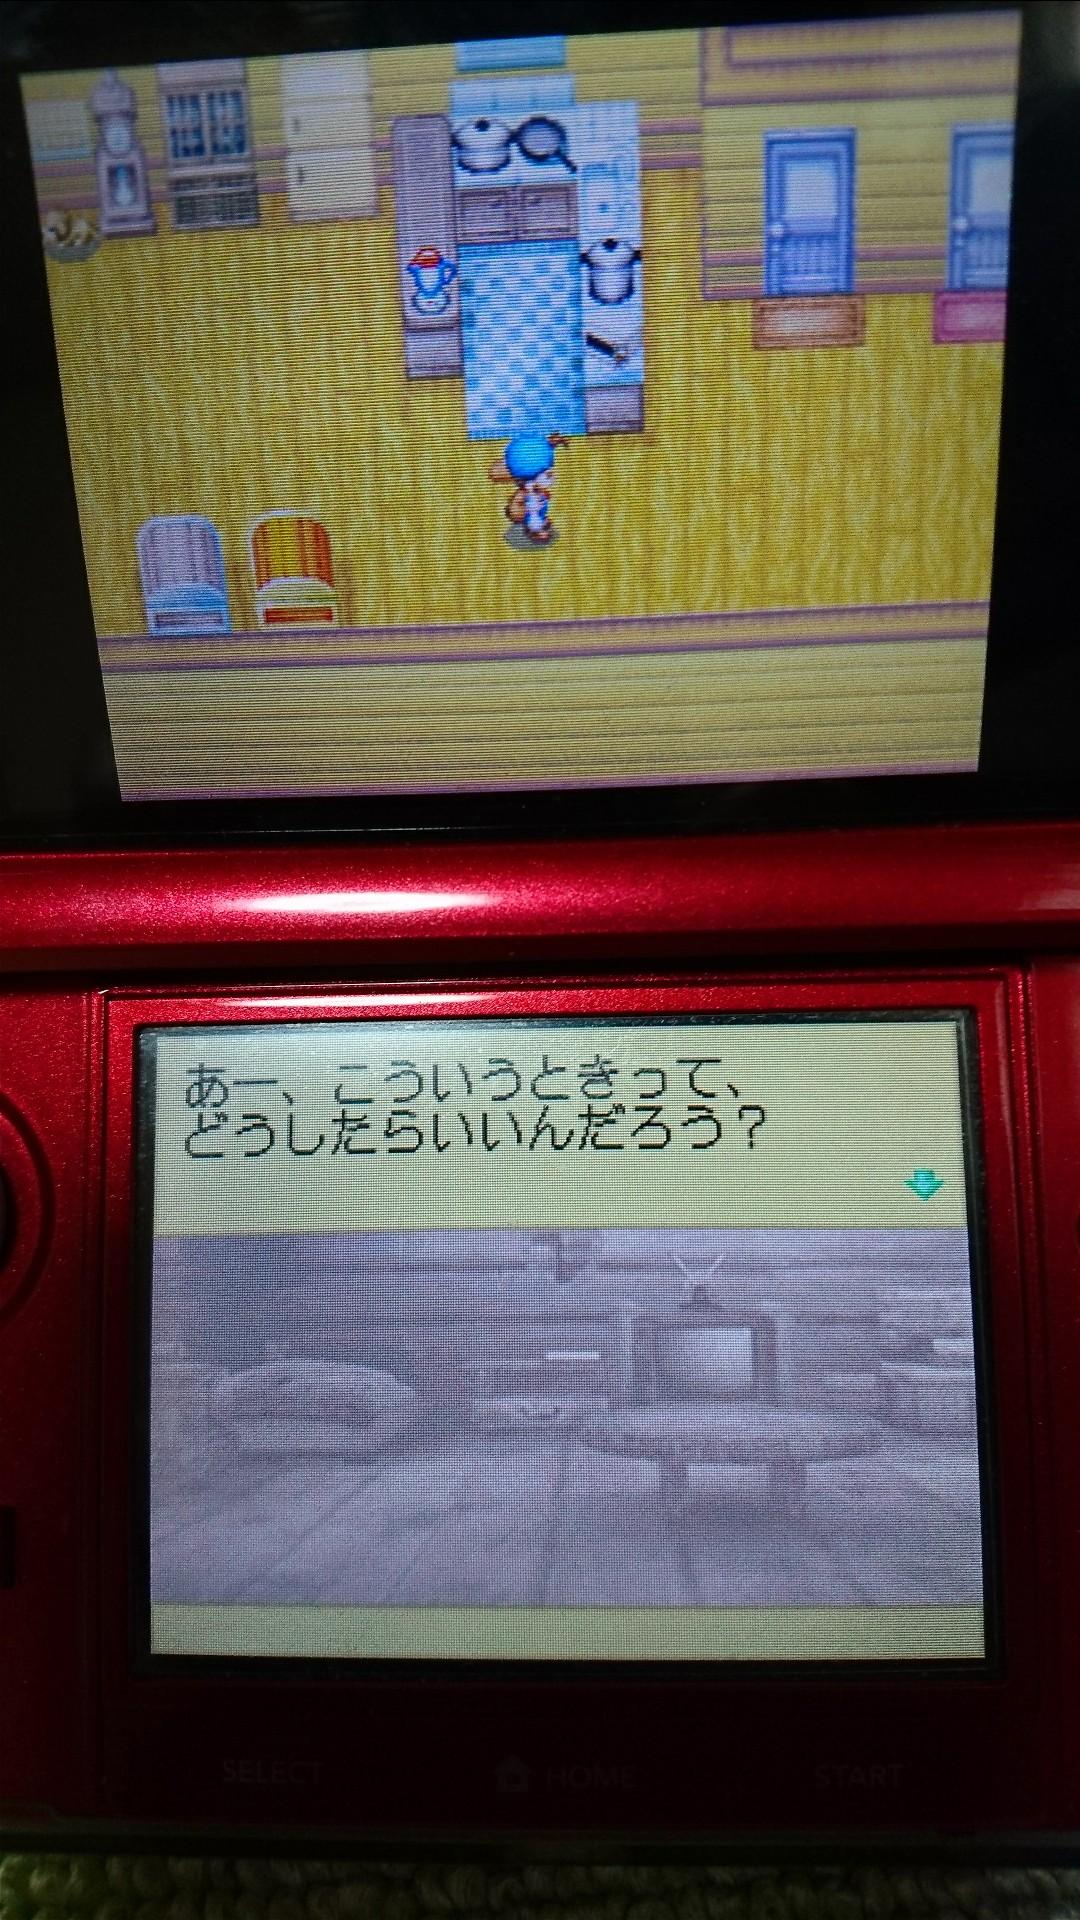 f:id:kiribosisama:20191104164845j:image